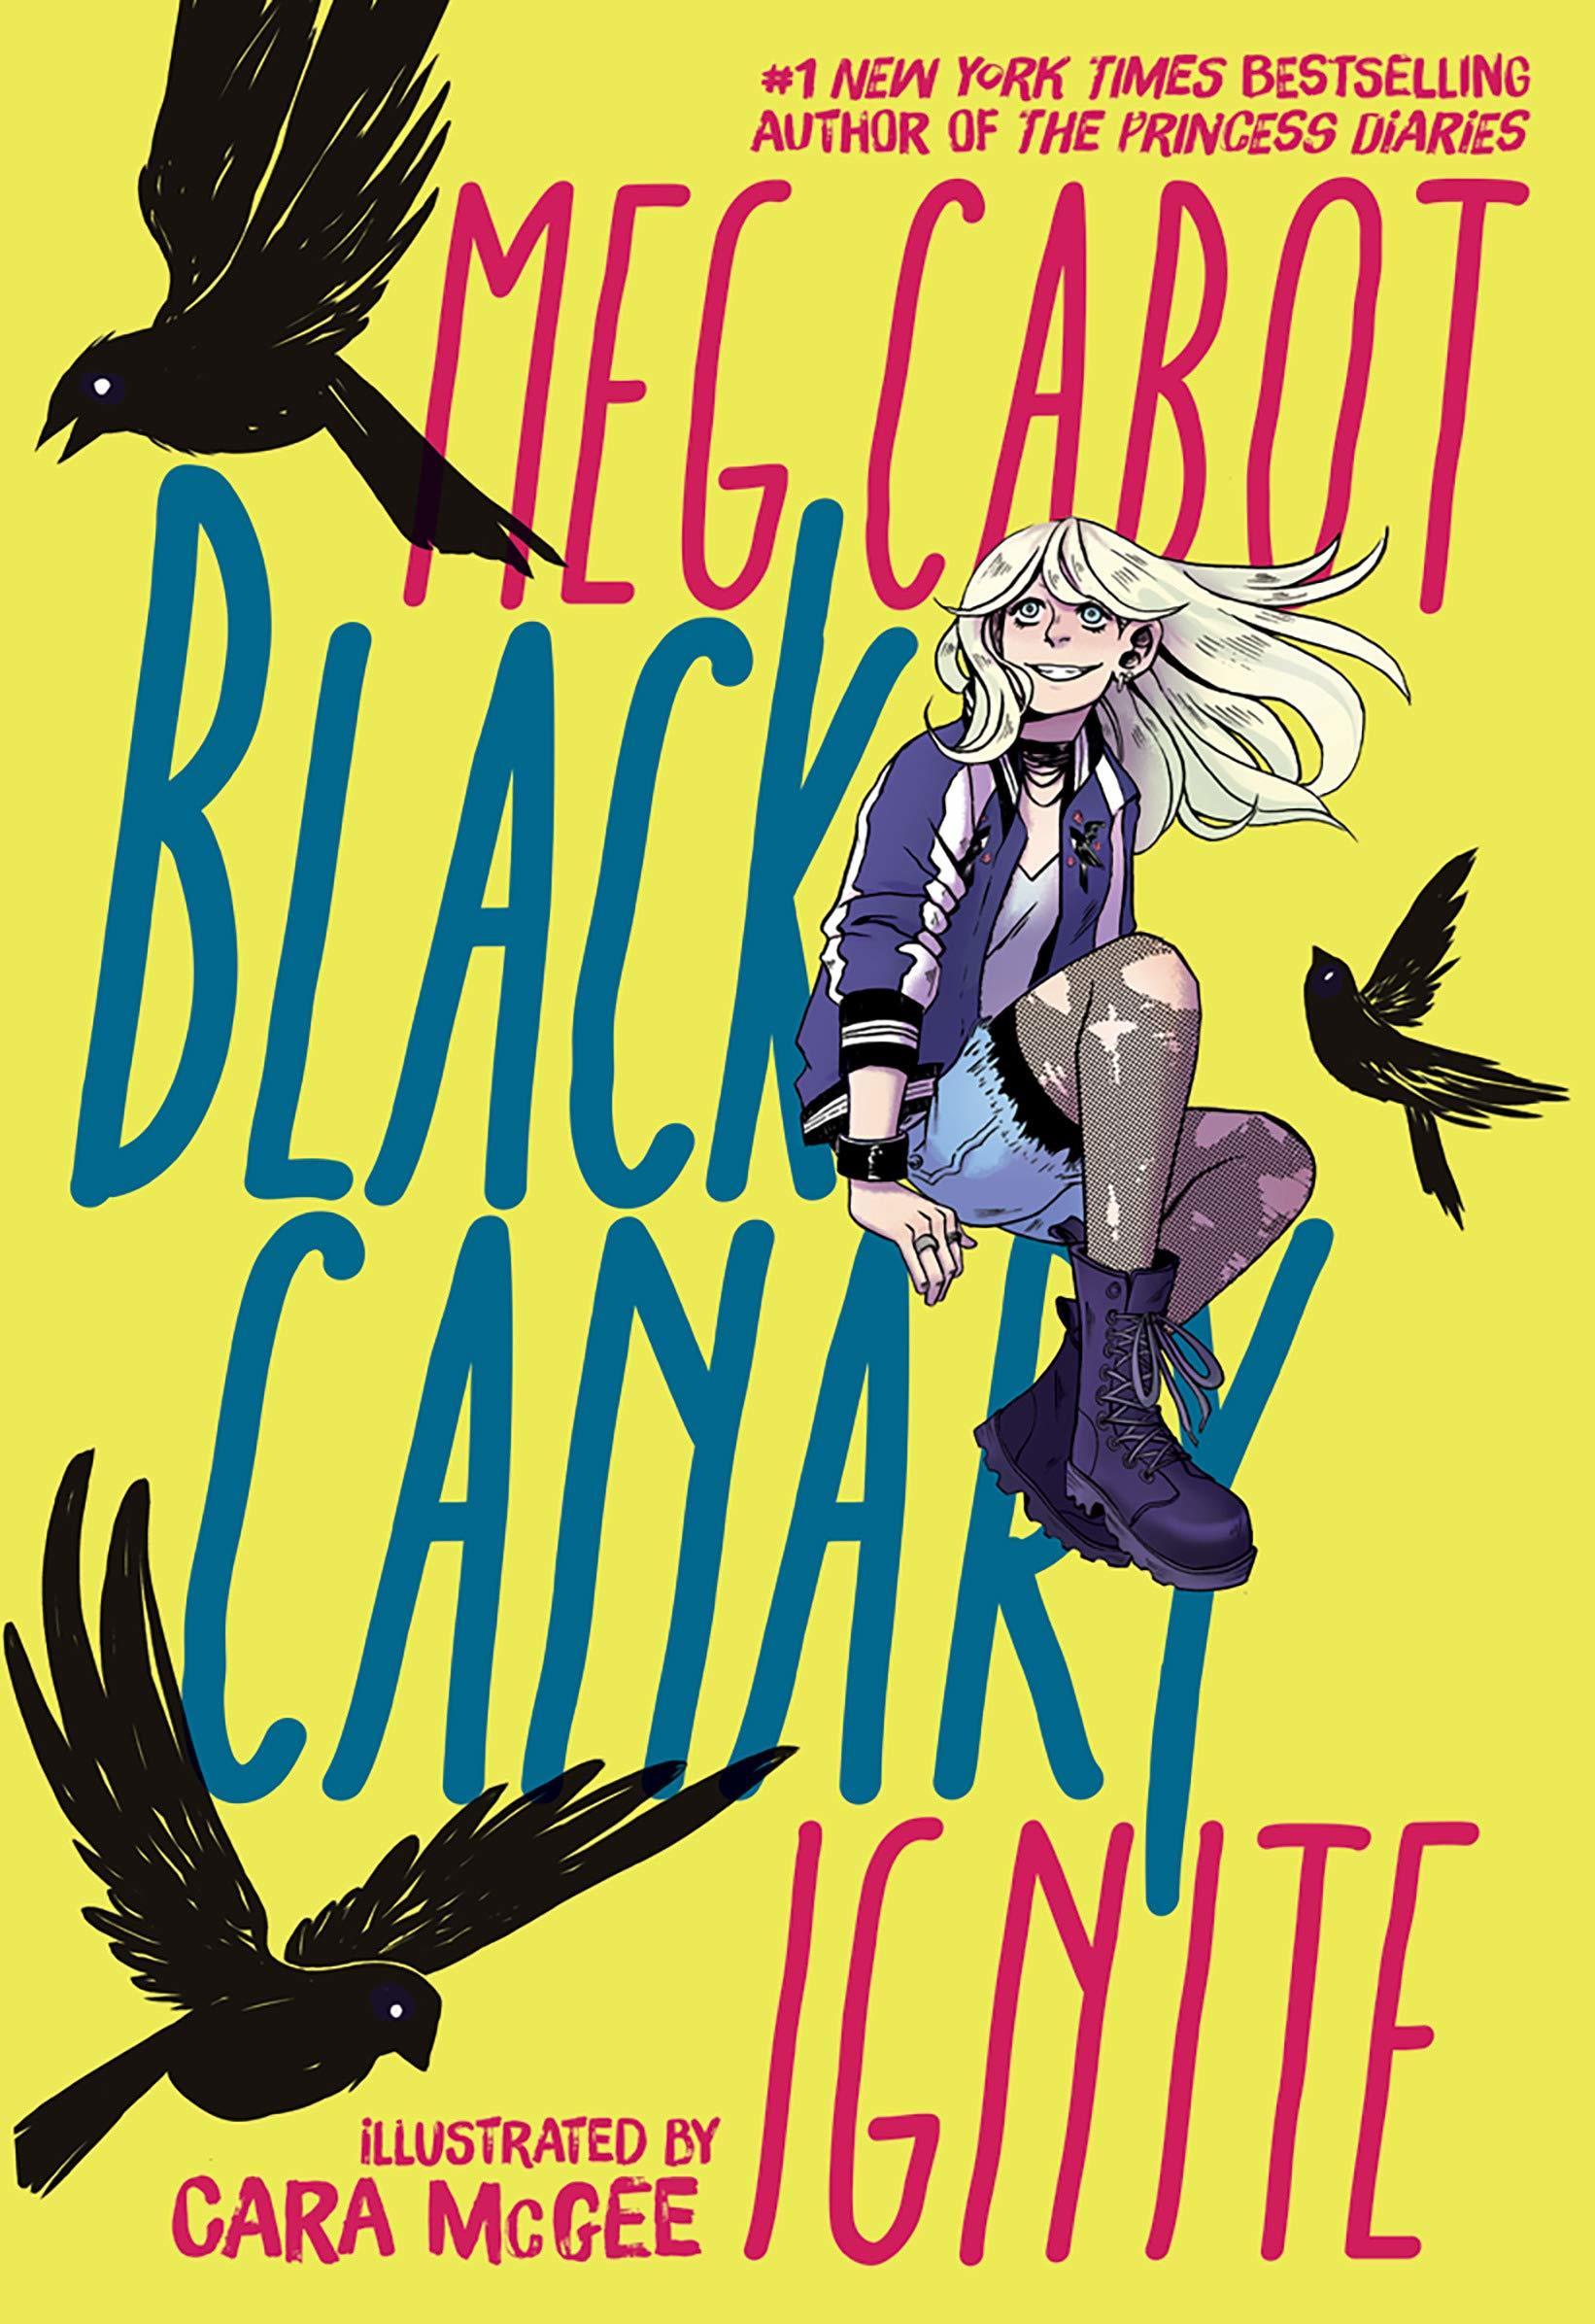 Black Canary: Ignite